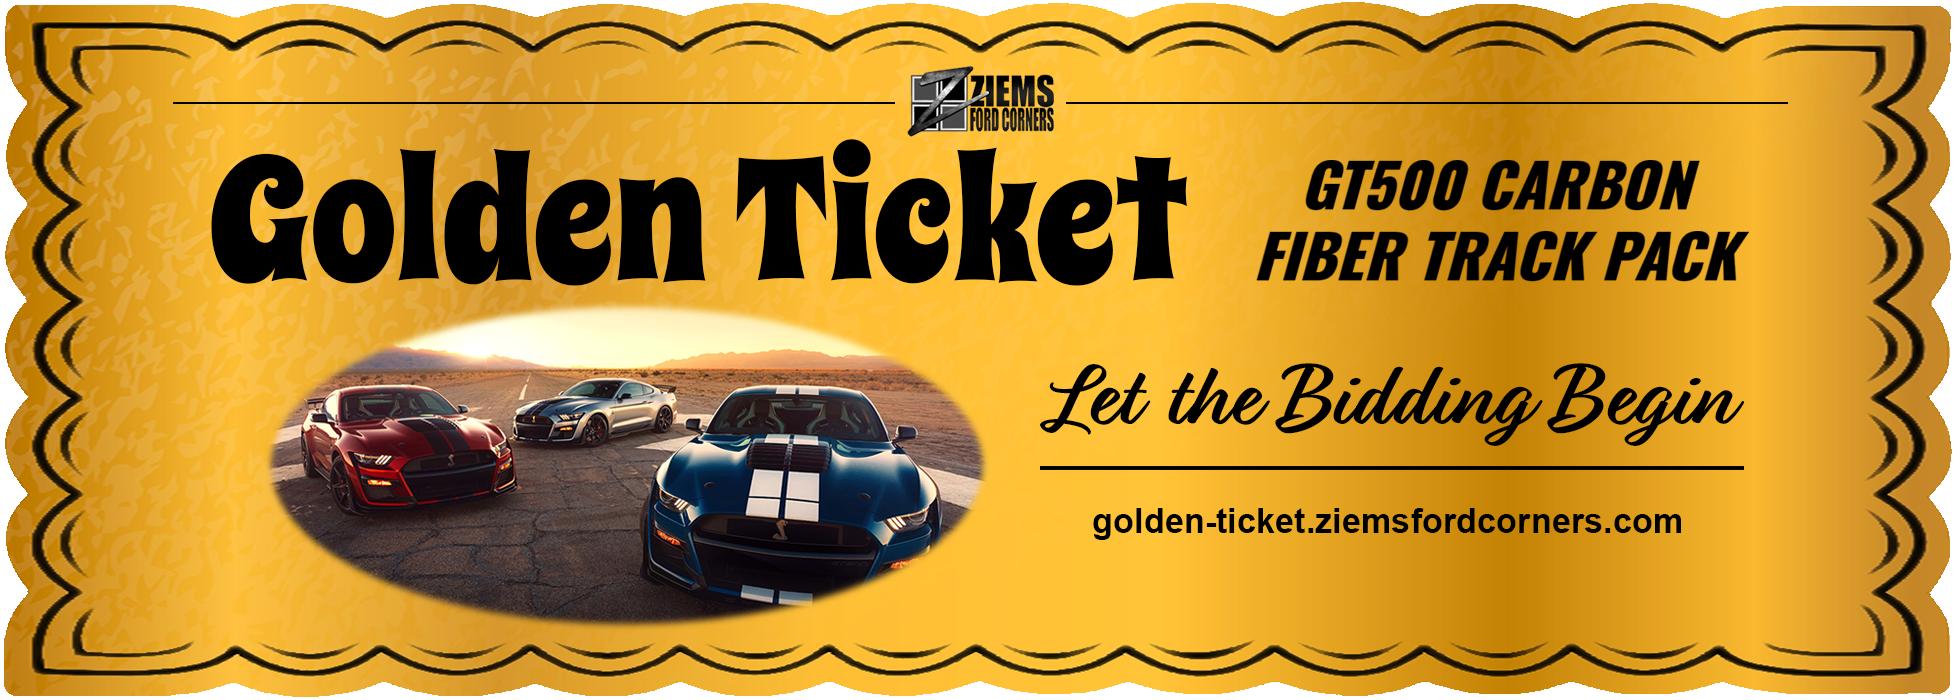 Golden Ticket Banner3